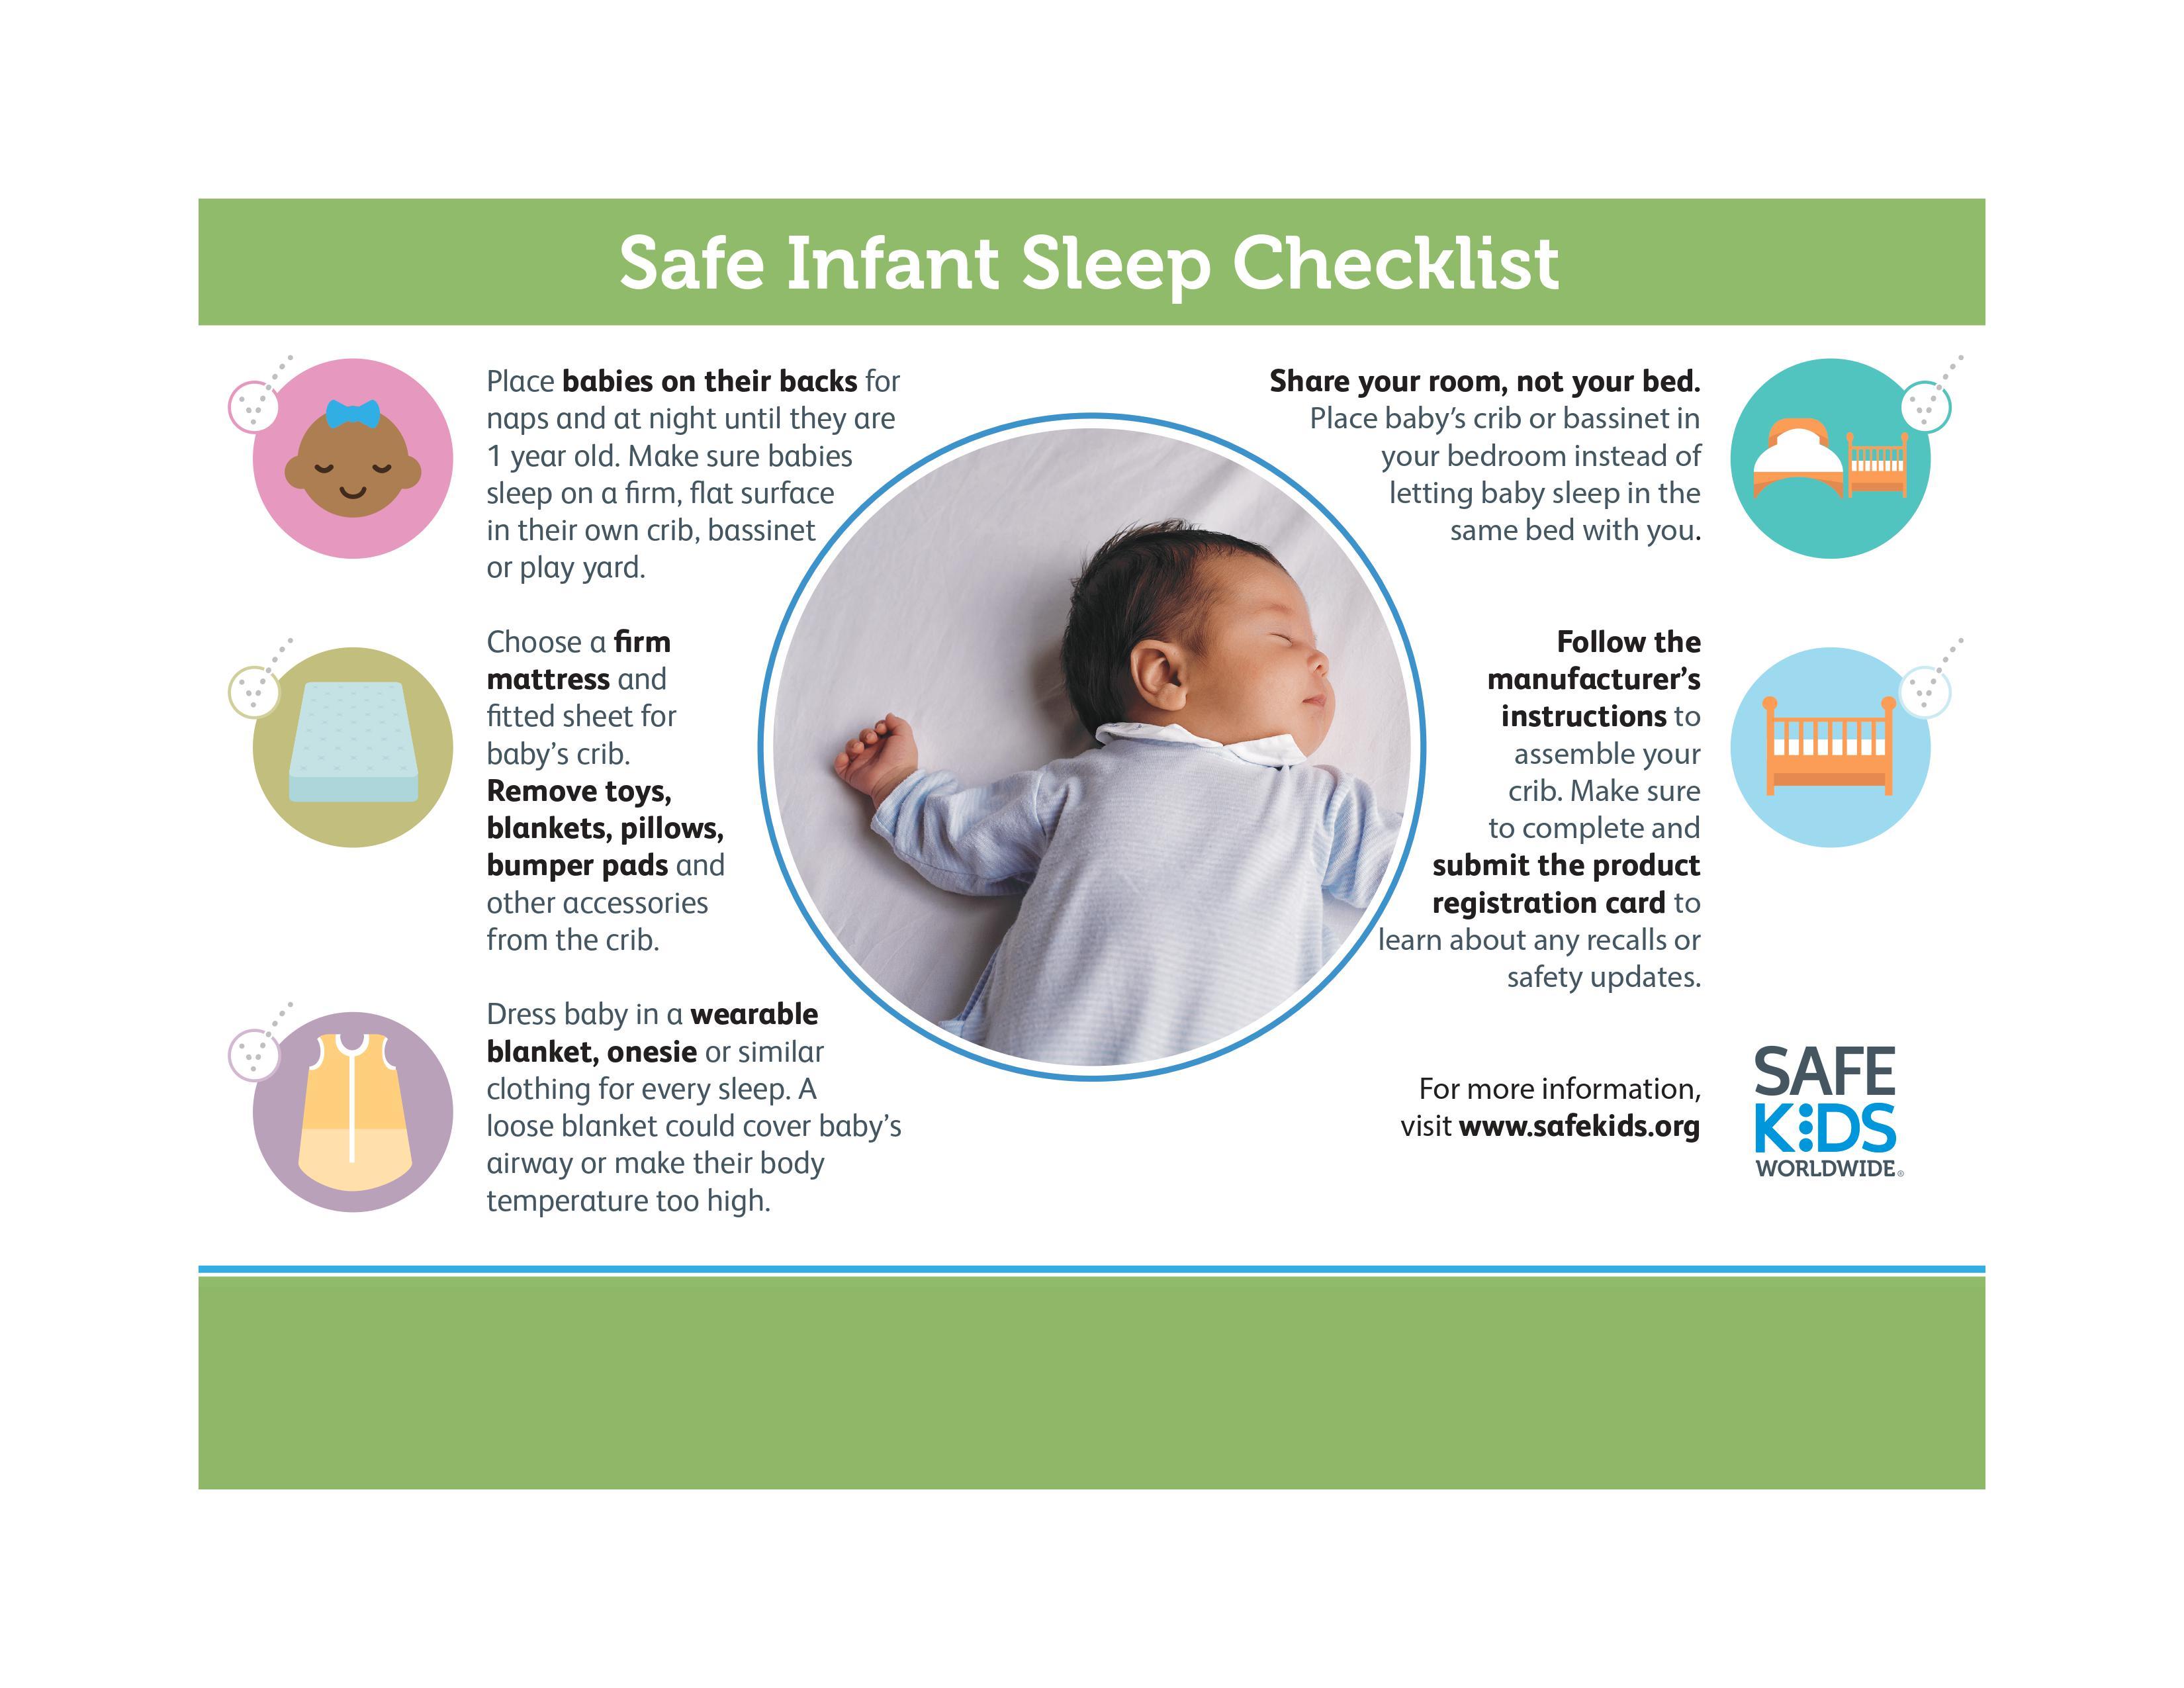 Infant Sleep Checklist graphic